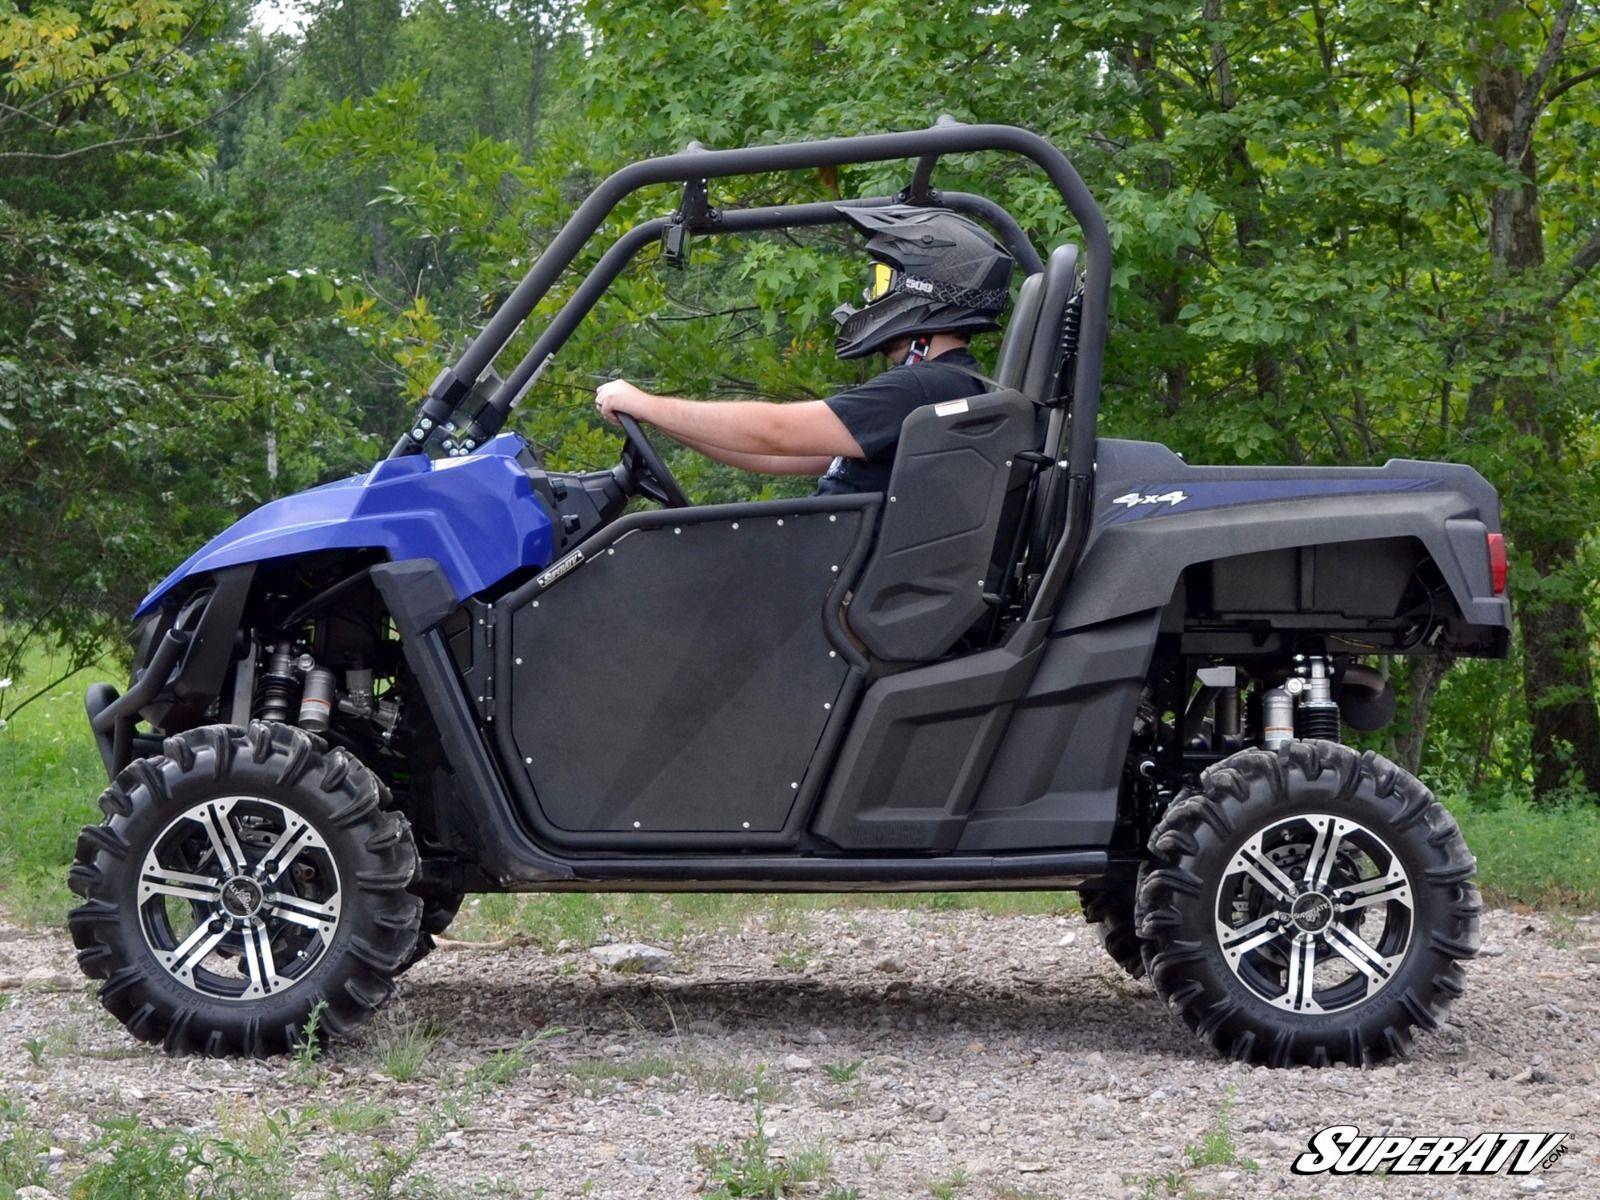 Super ATV Doors & Super ATV Doors for Yamaha Wolverine \u0026 Viking